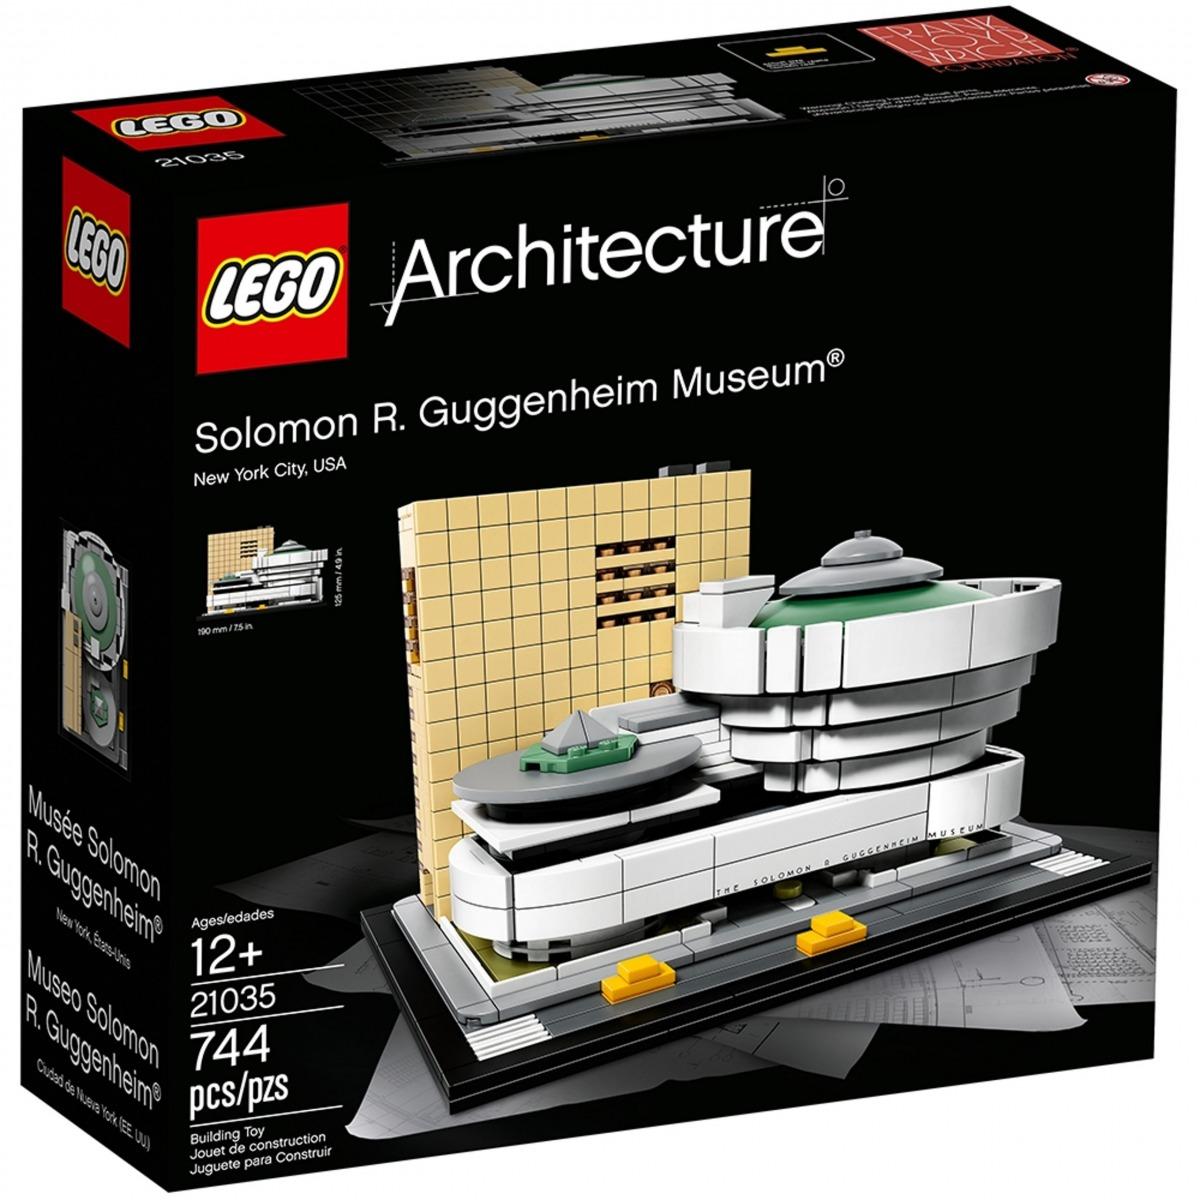 lego 21035 solomon r guggenheim museum scaled